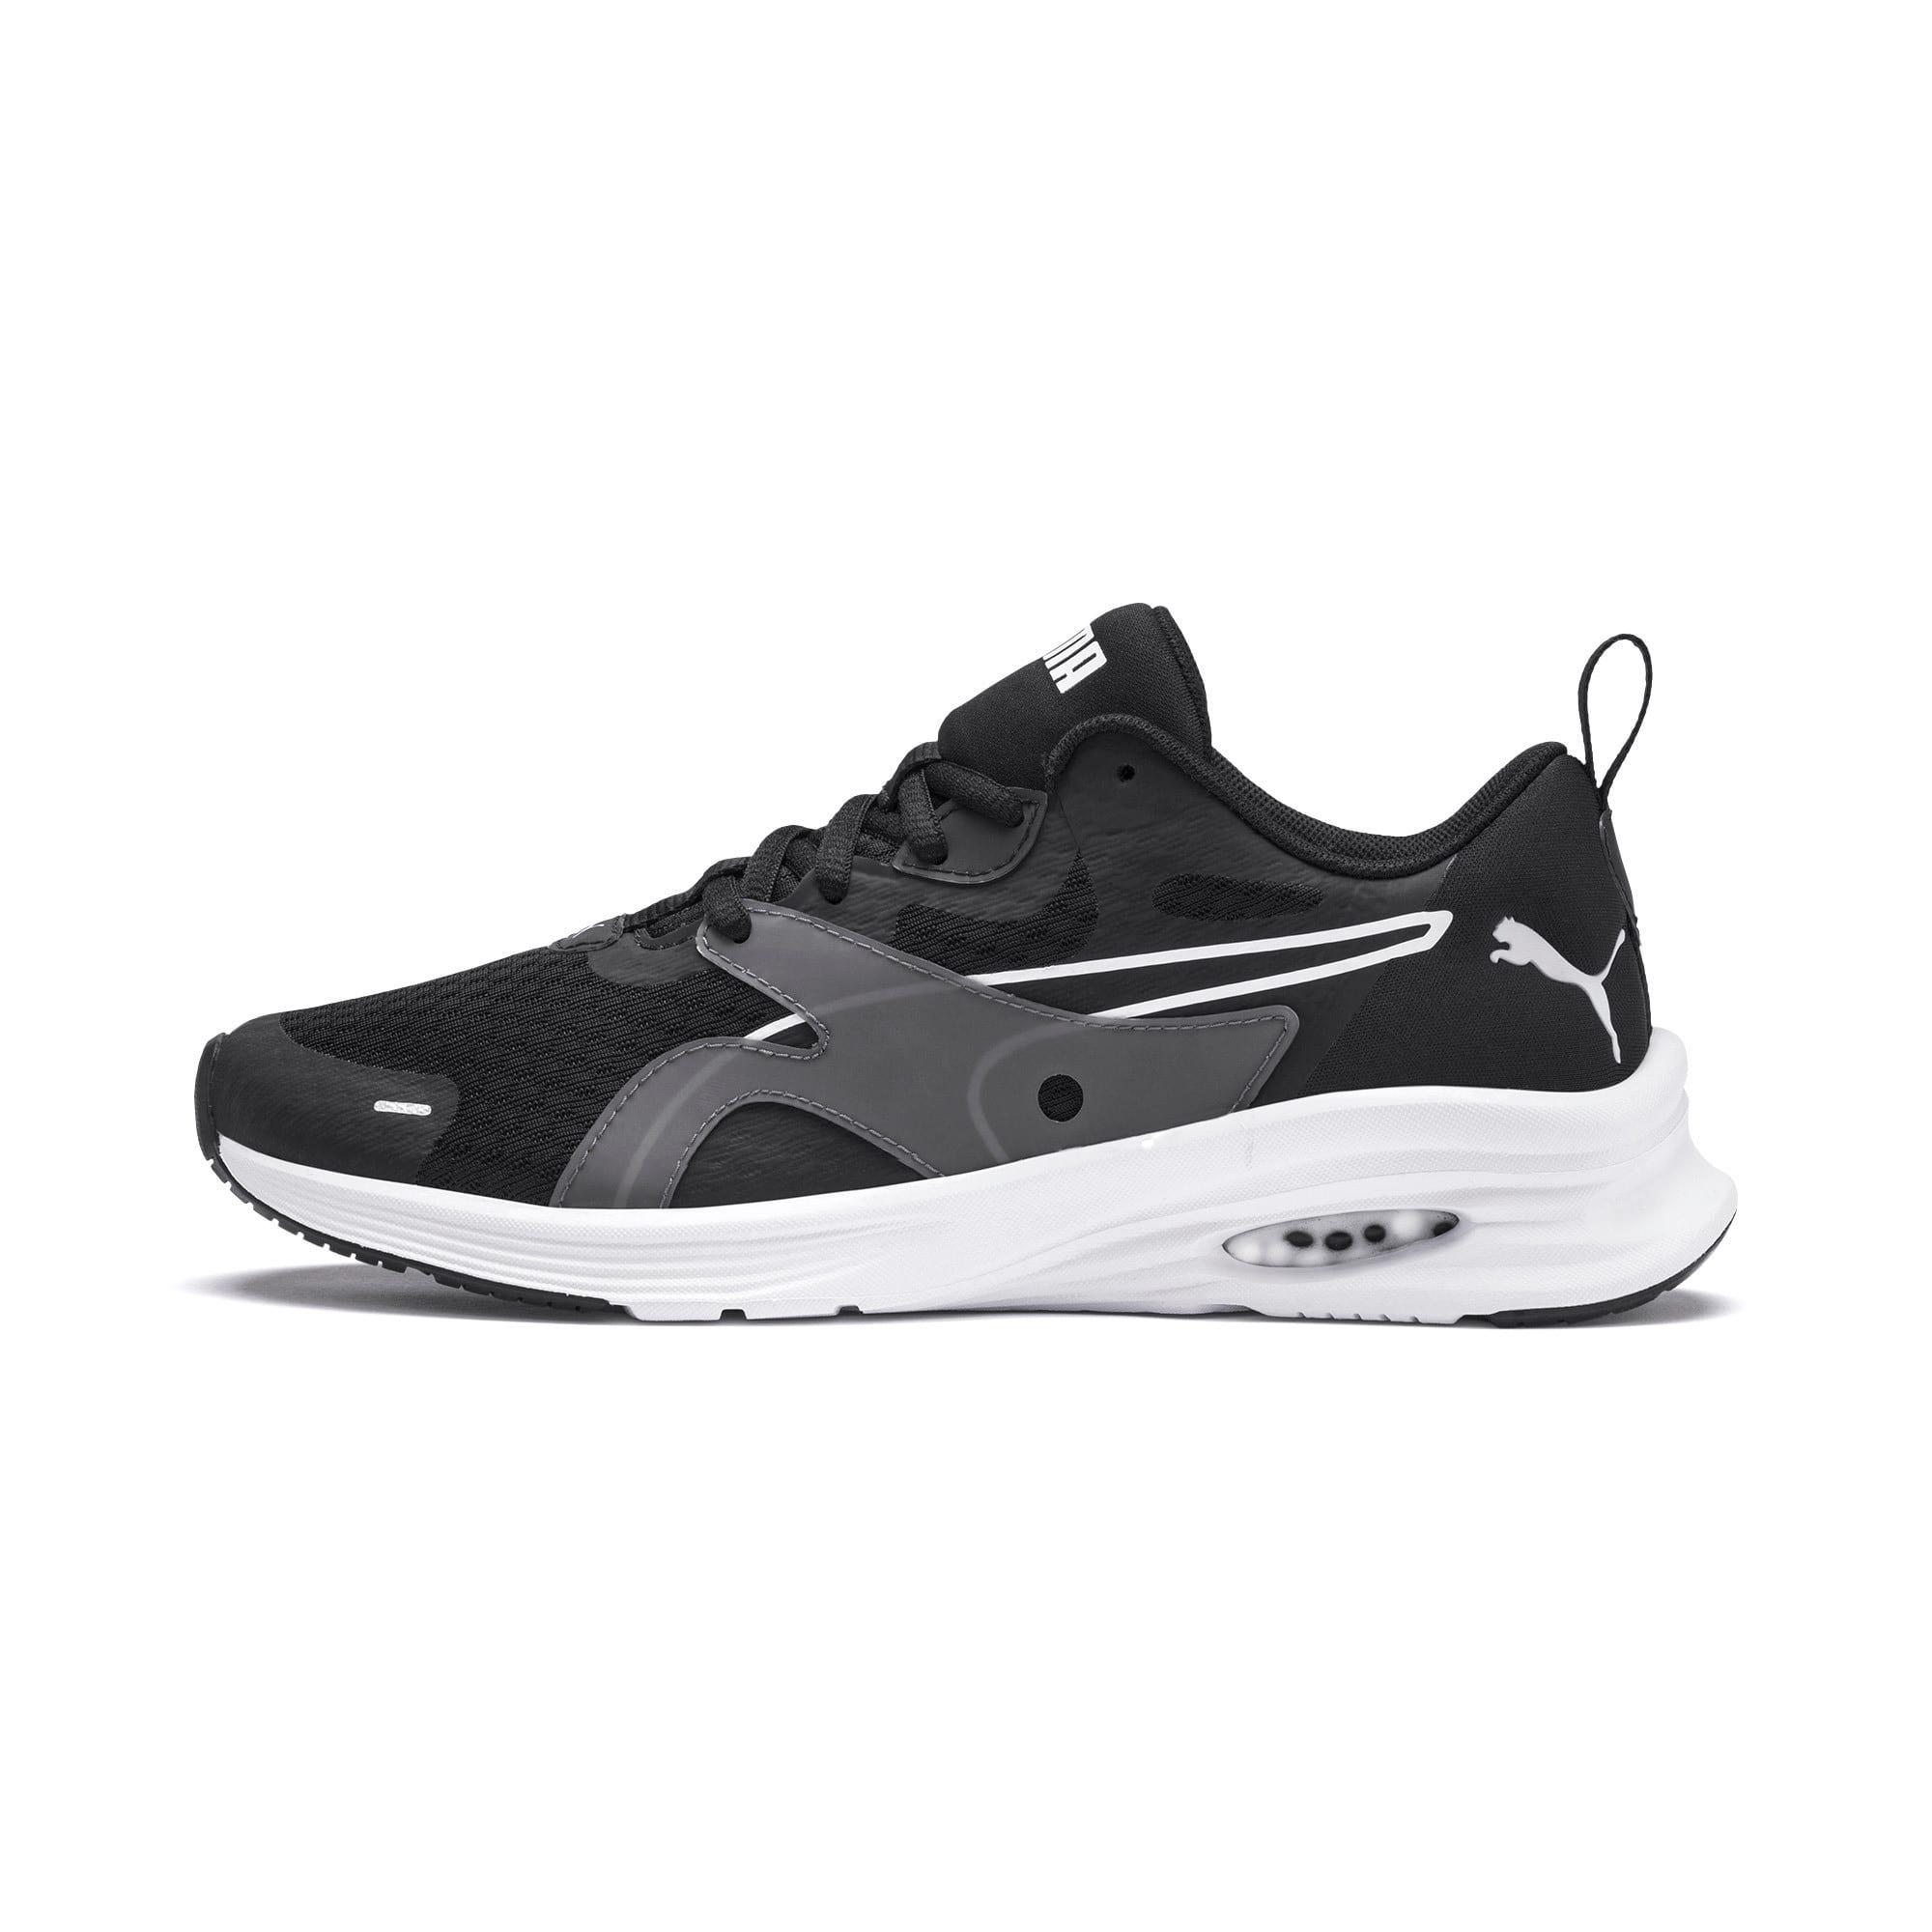 Thumbnail 1 of Damskie buty do biegania HYBRID Fuego, Puma Black-Puma White, medium